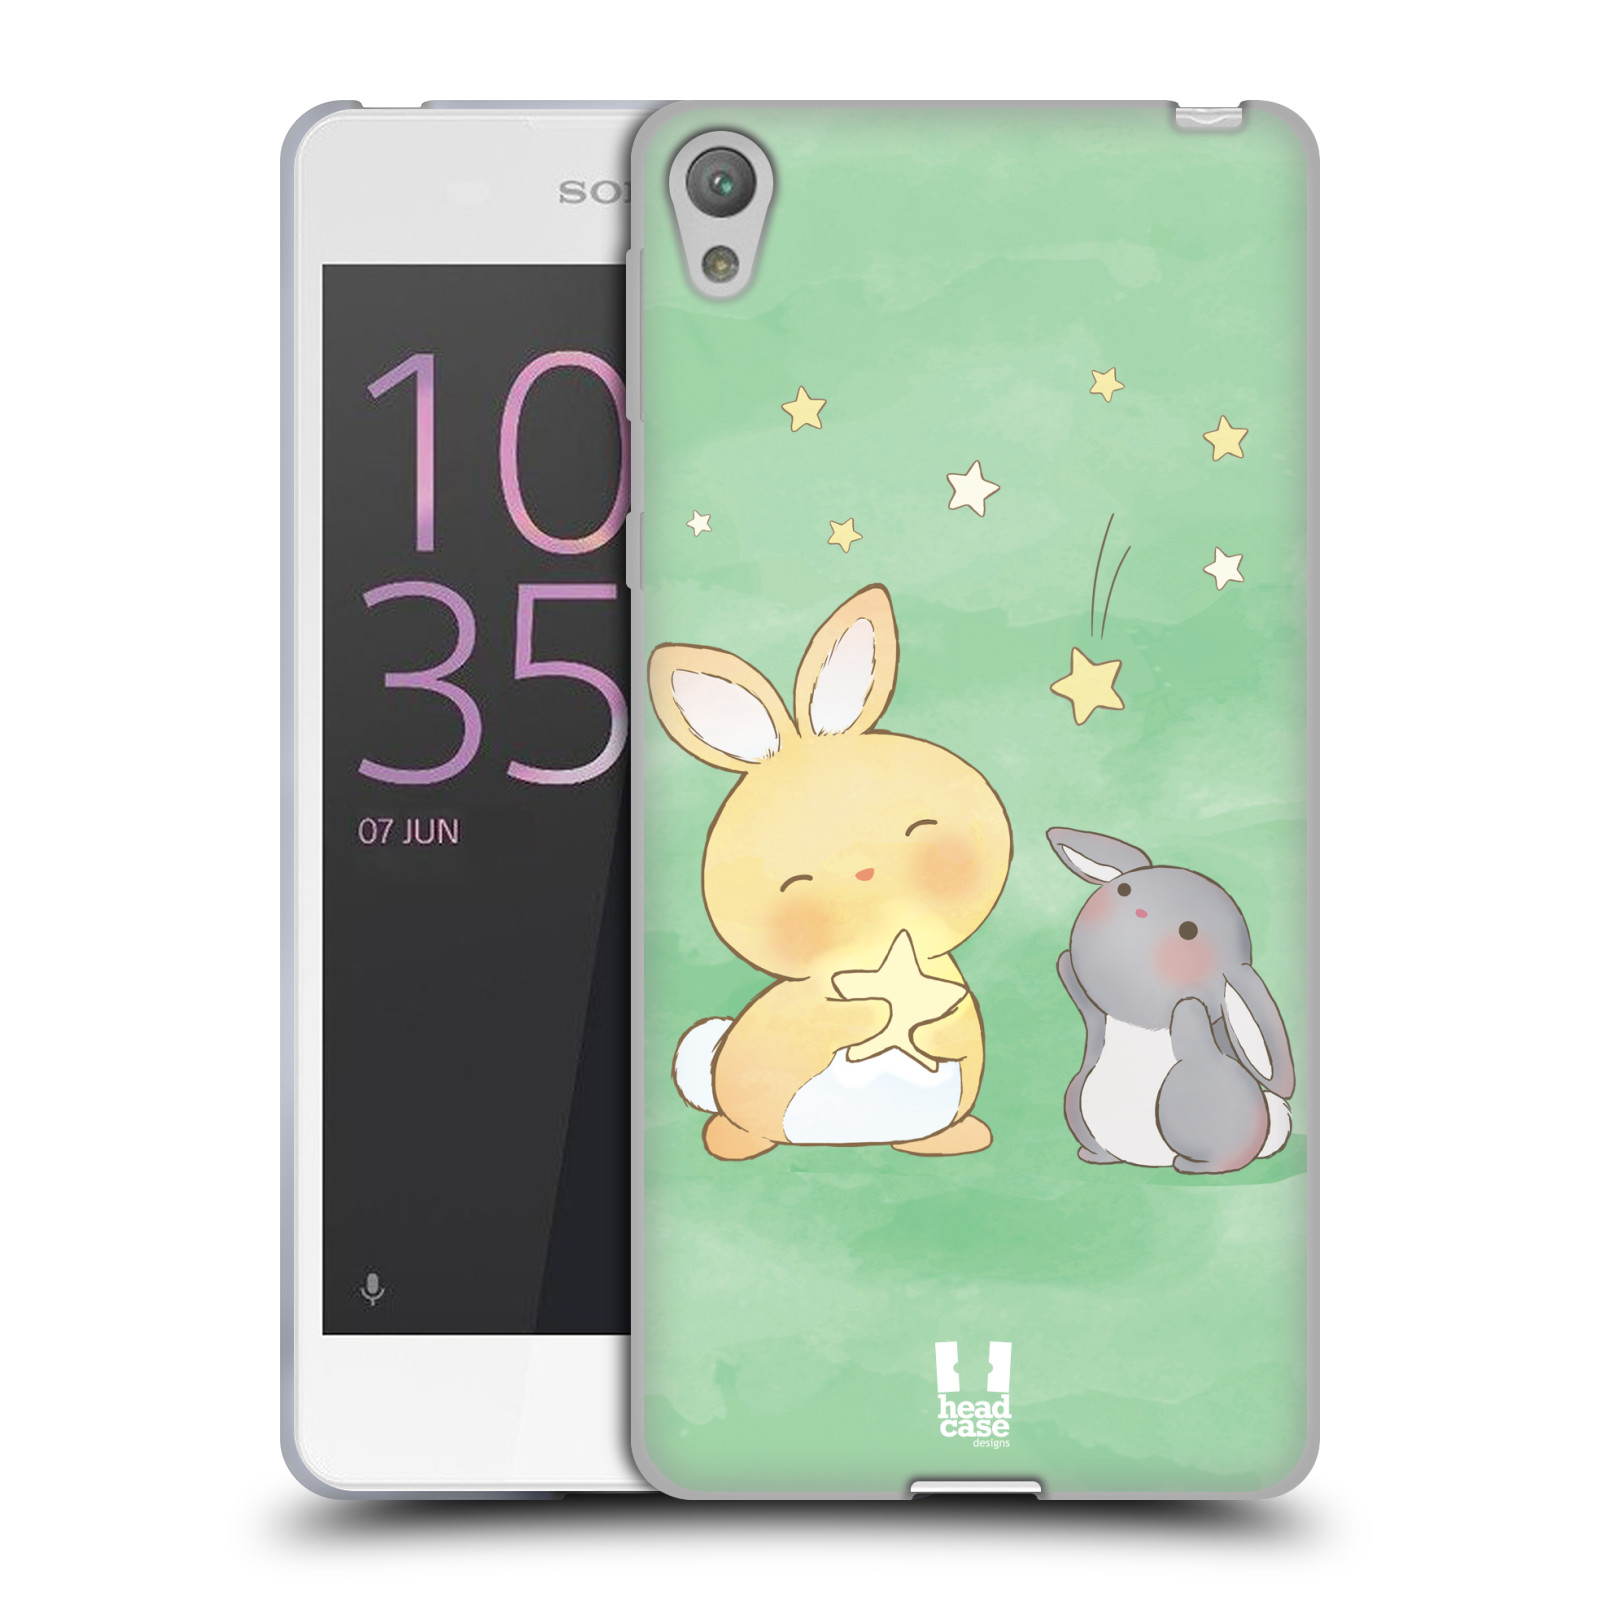 HEAD CASE silikonový obal na mobil SONY XPERIA E5 vzor králíček a hvězdy zelená